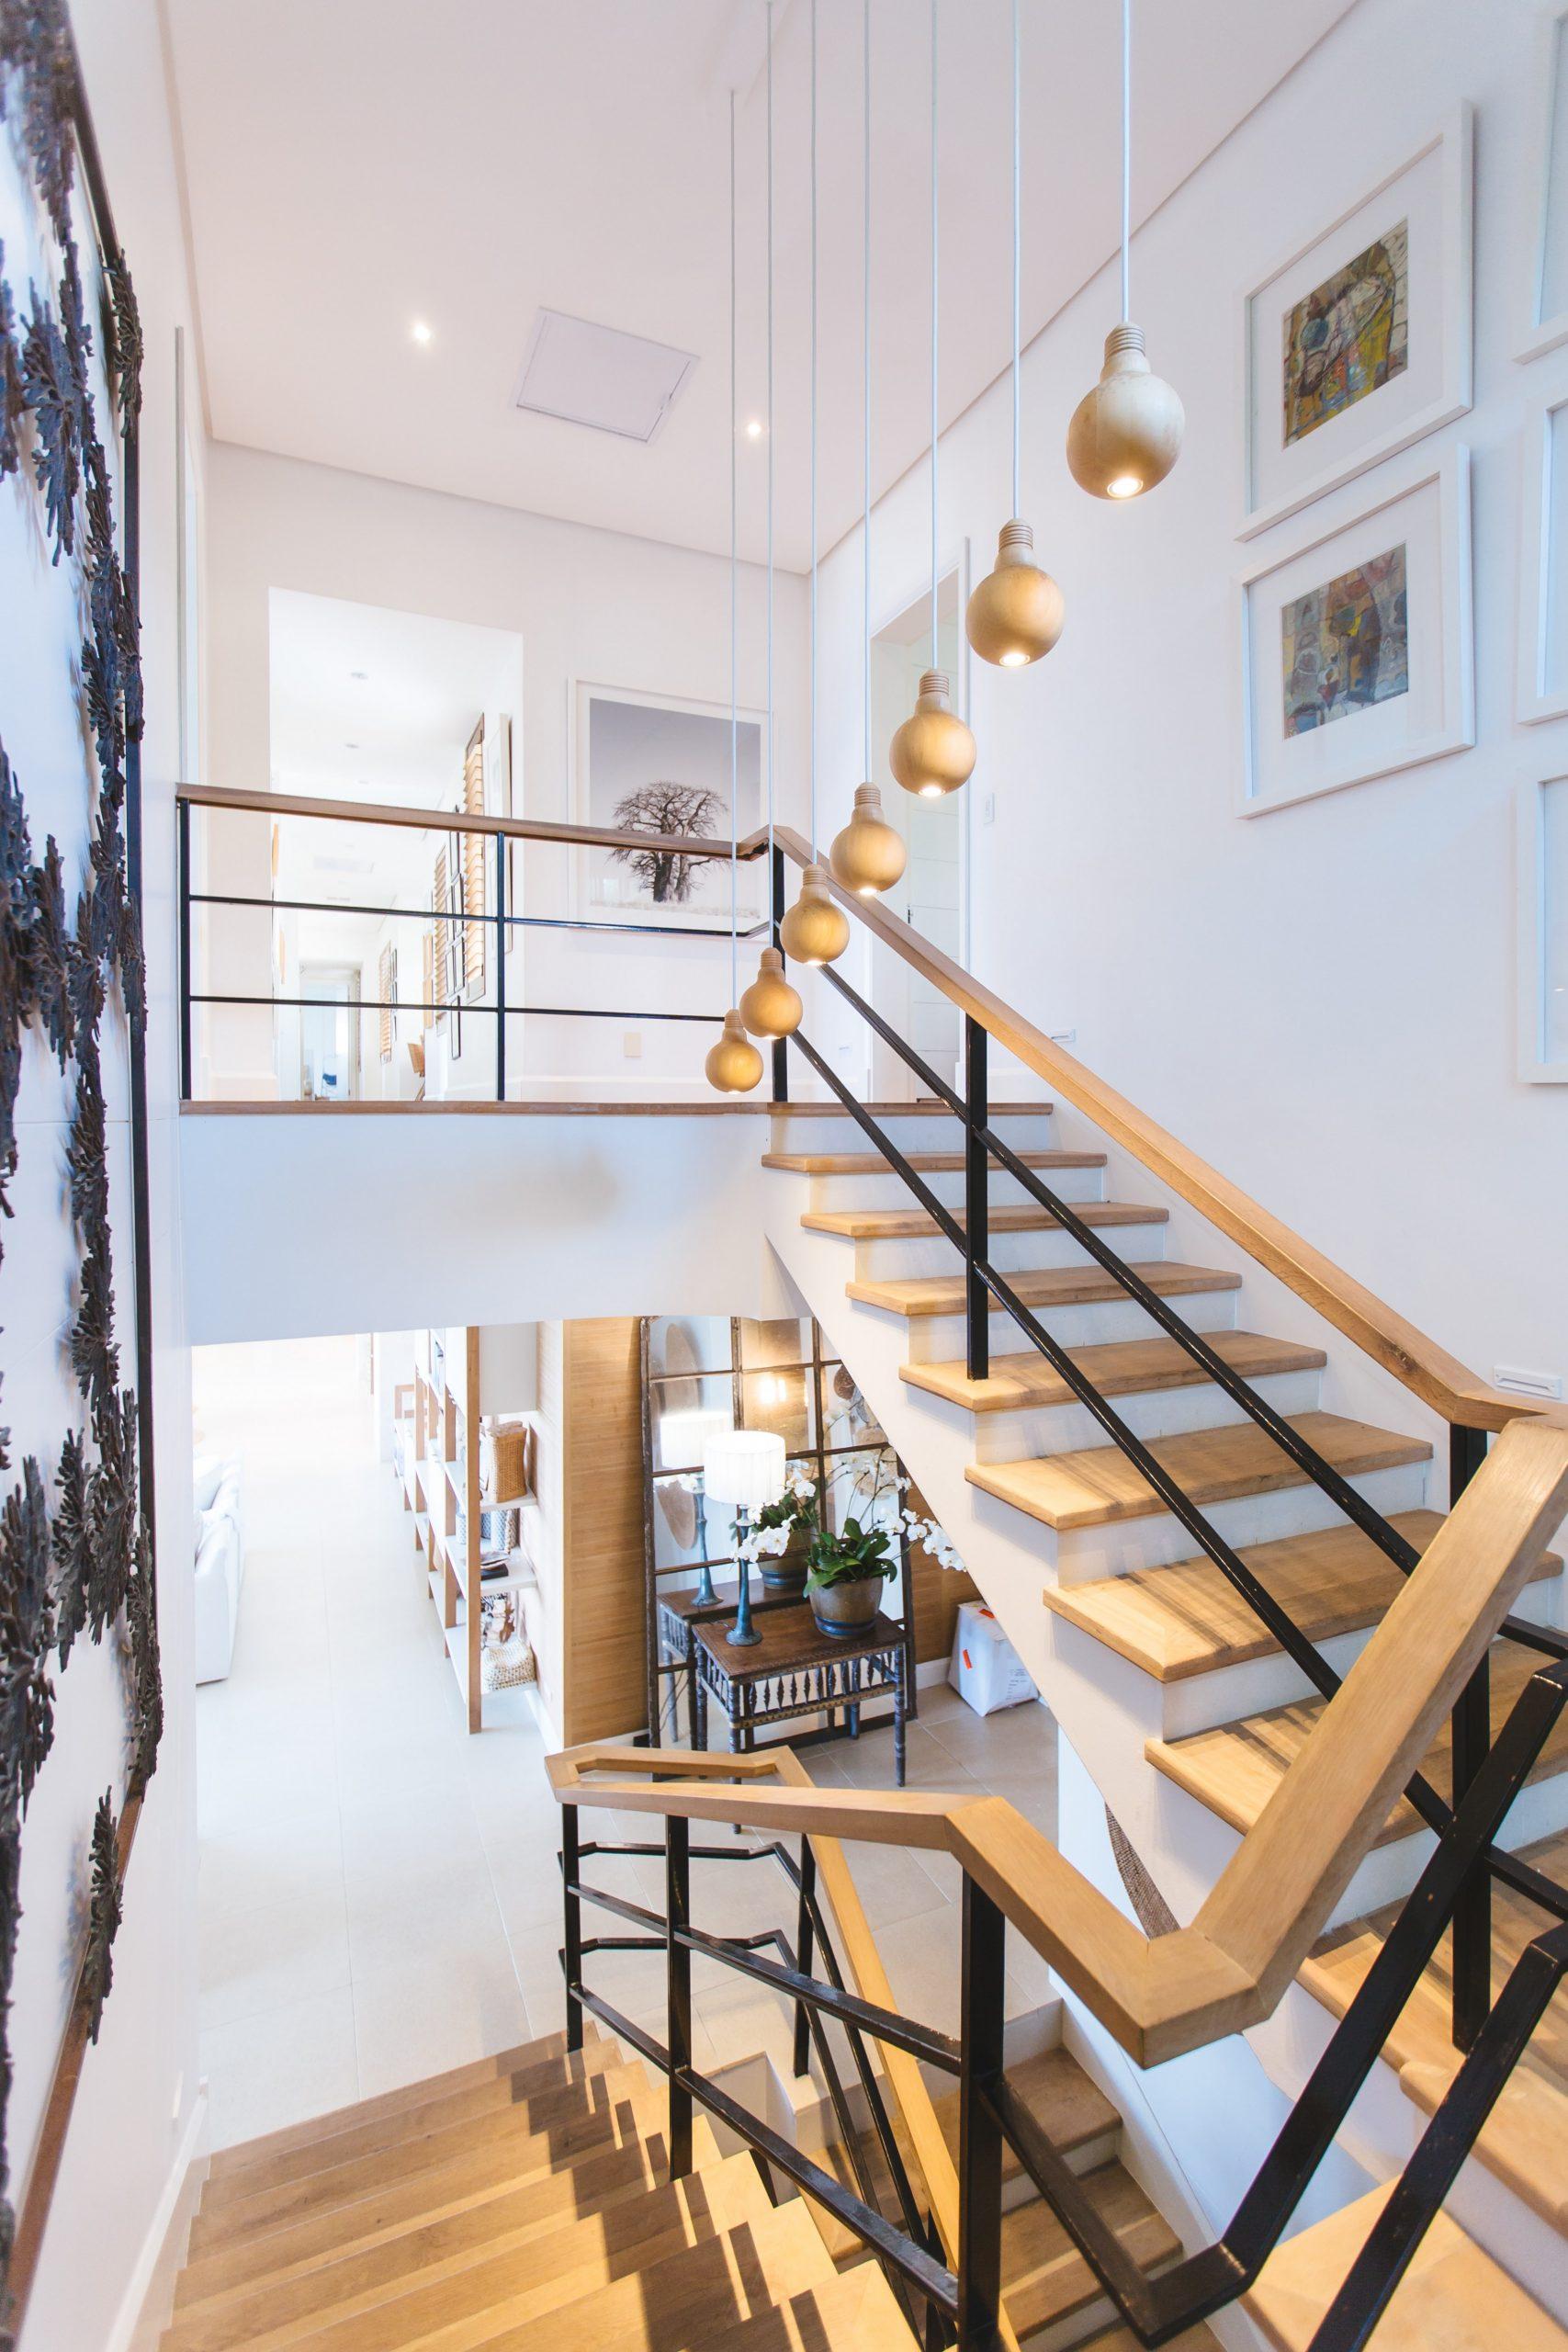 12+ Interior Design Pictures [HD]  Download Free Images on Unsplash - Apartment Design Hd